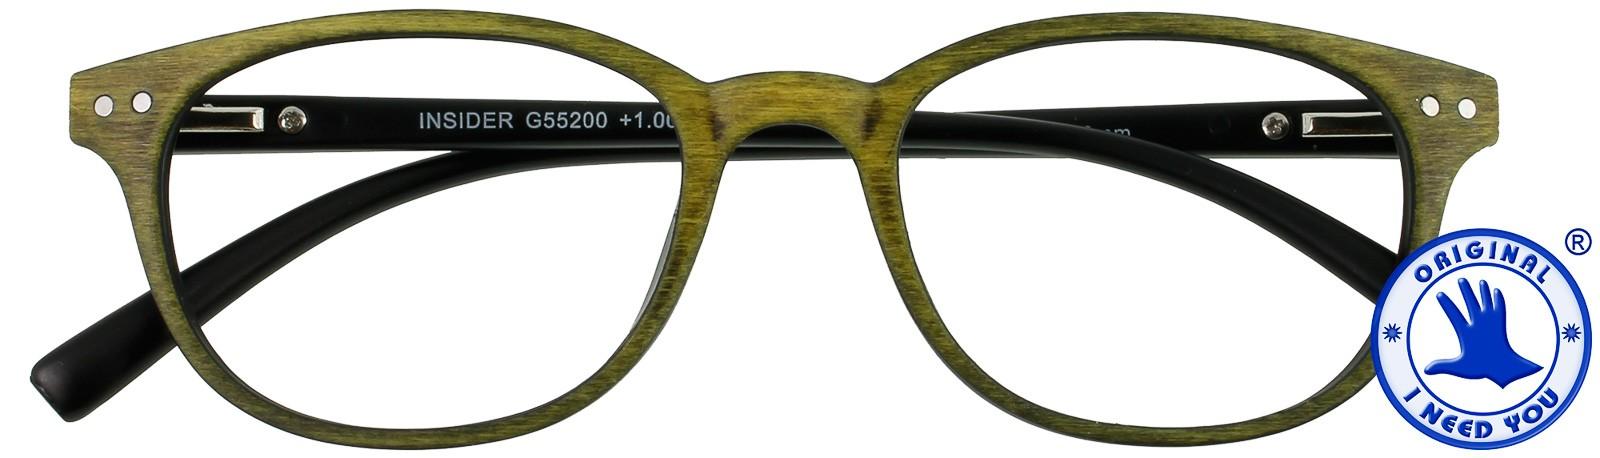 Insider (grün) - Holzdesign